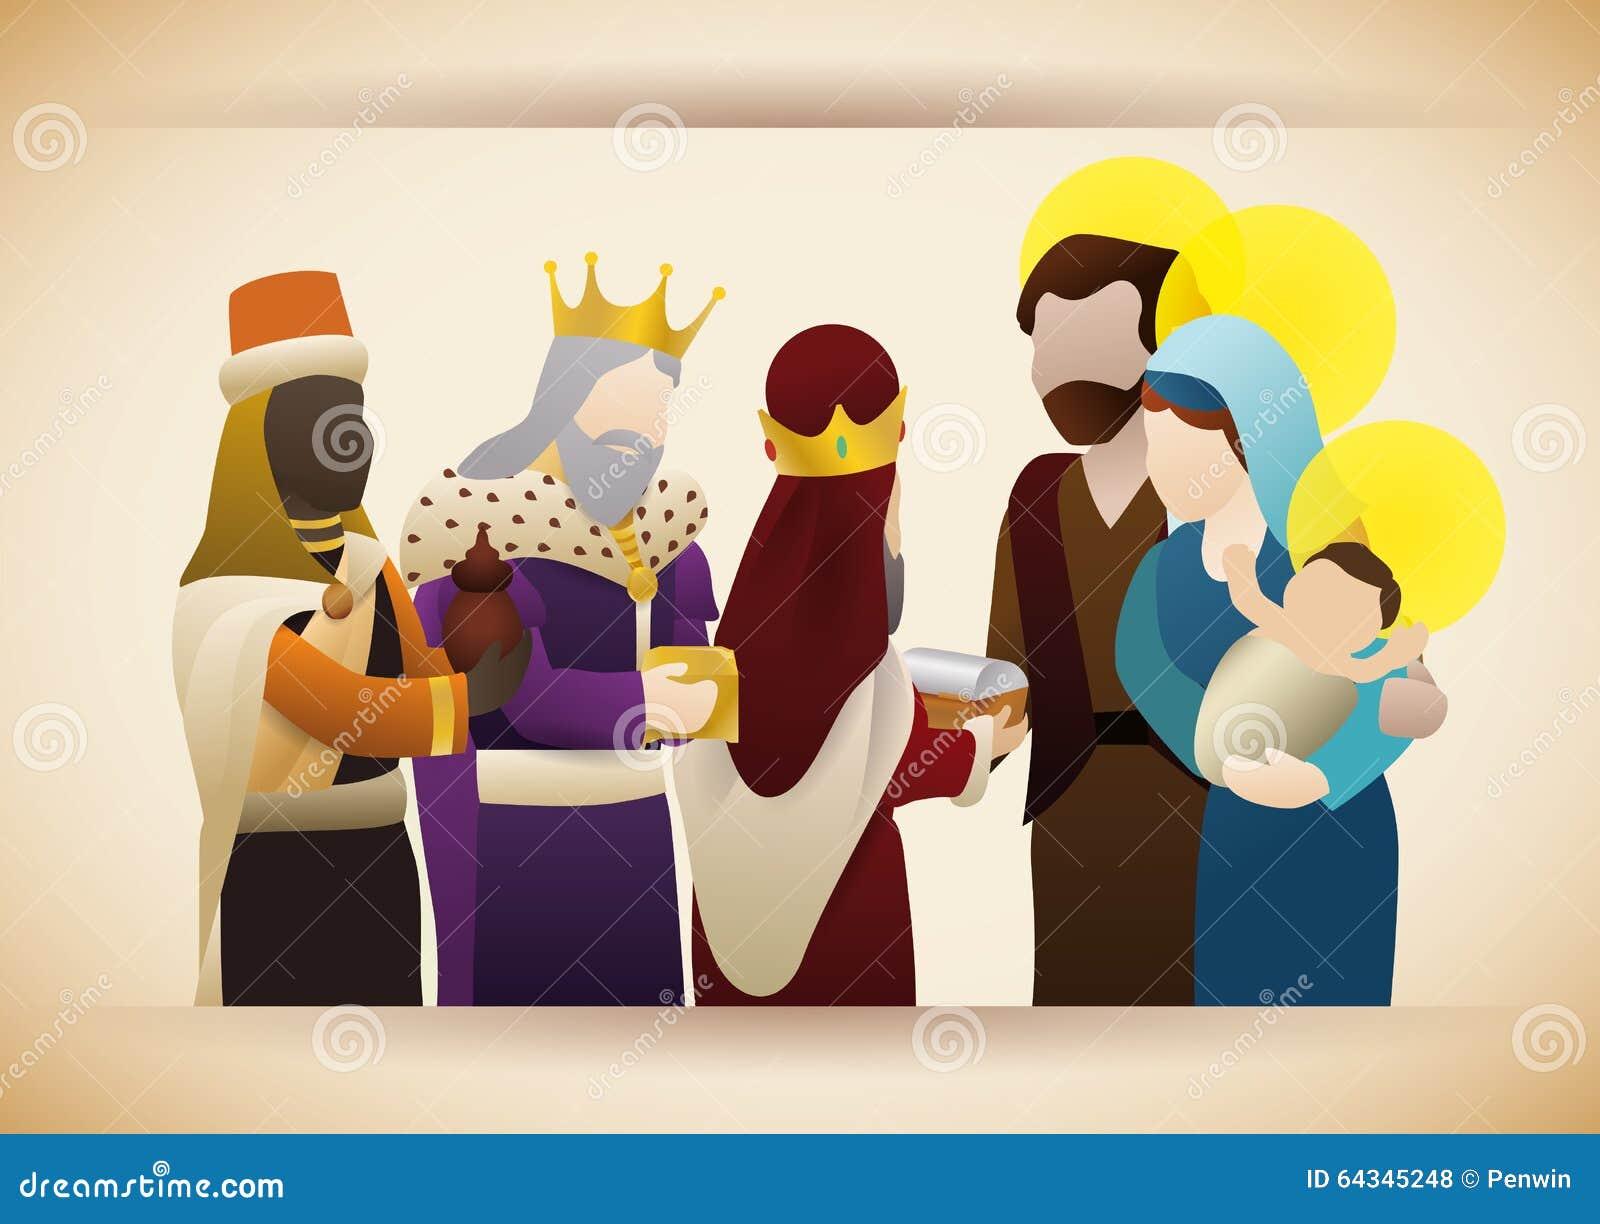 Jesus easter gift is eternal life Royalty Free Vector Image